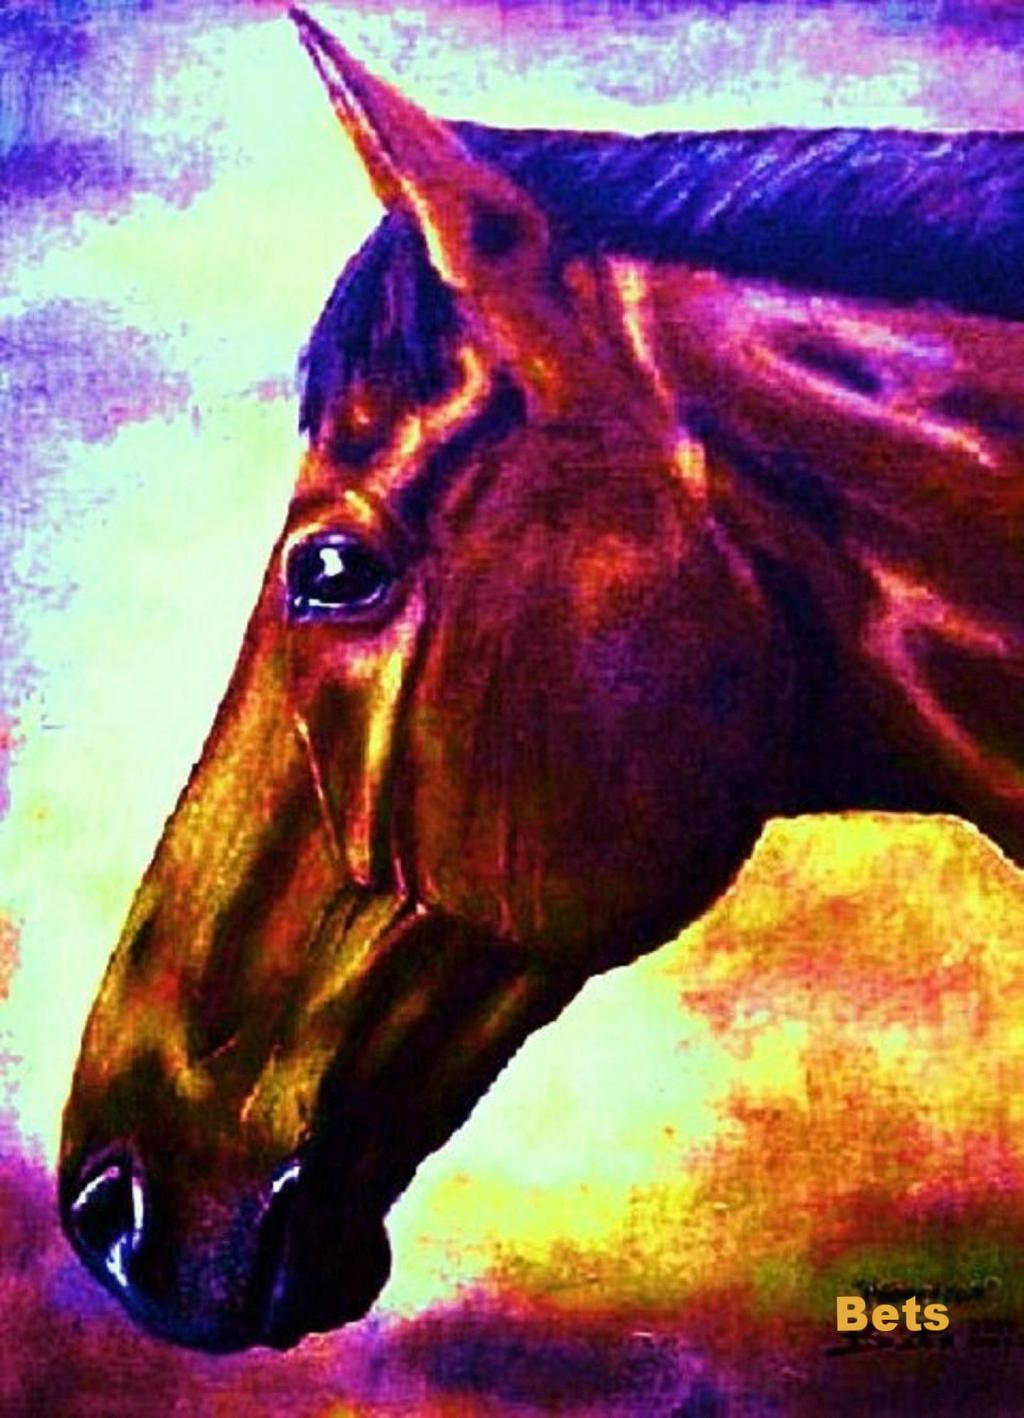 Giclee HORSE PRINT BAY Horse PRINCETON artist BETS 6 COLORS 18 print Größe 14 X 18 COLORS d7b6c8